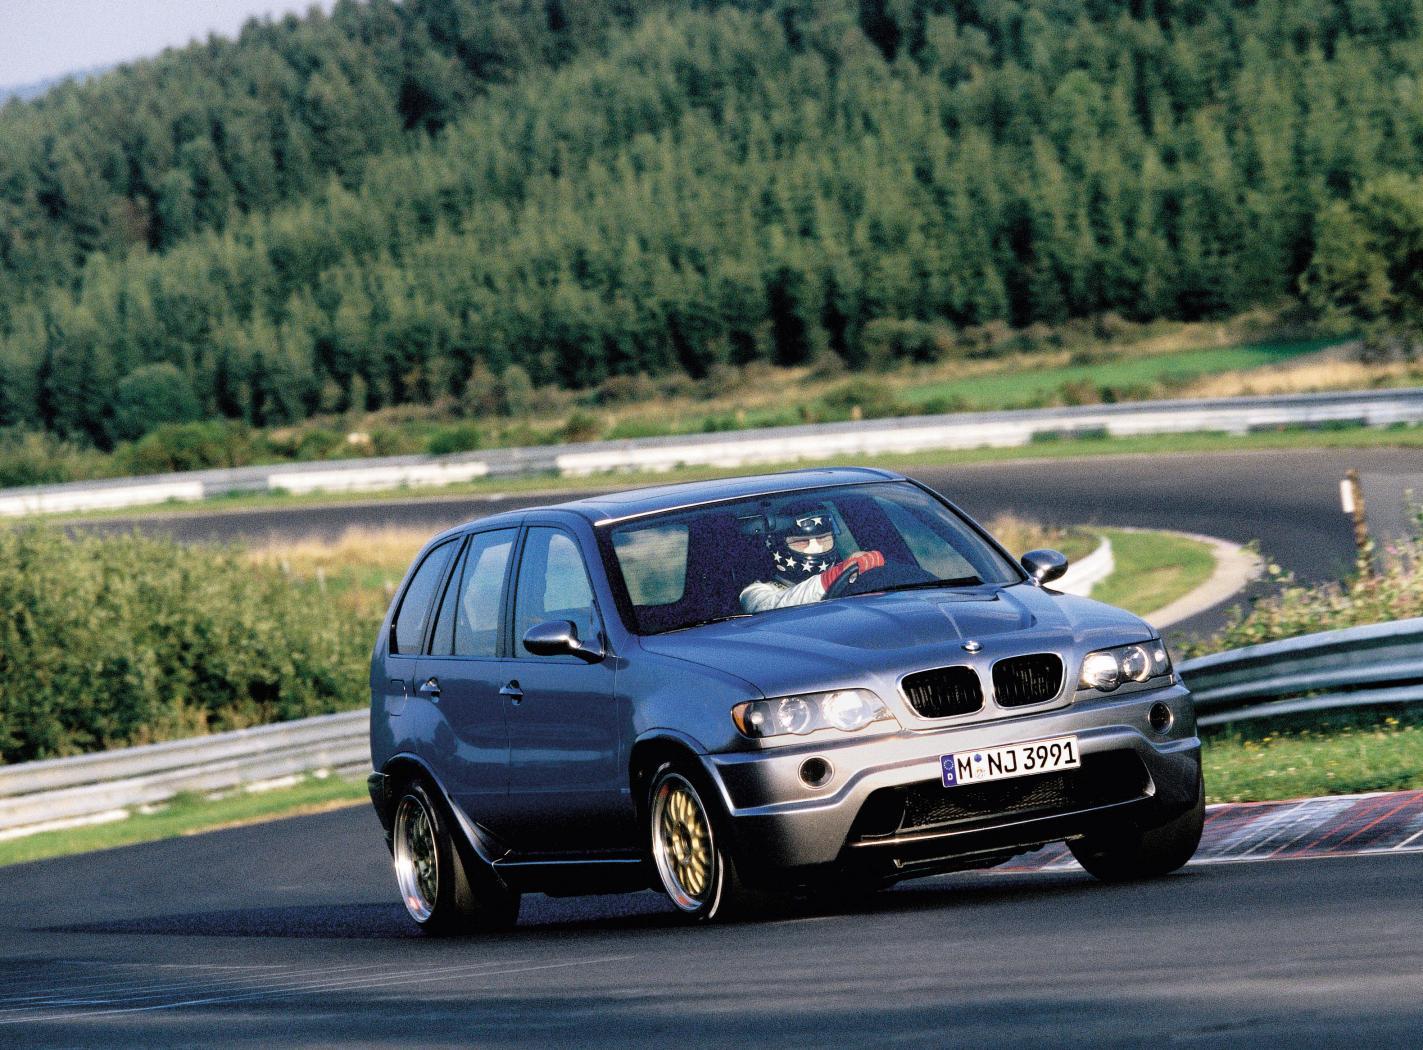 BMW-X5-E53-7.jpeg